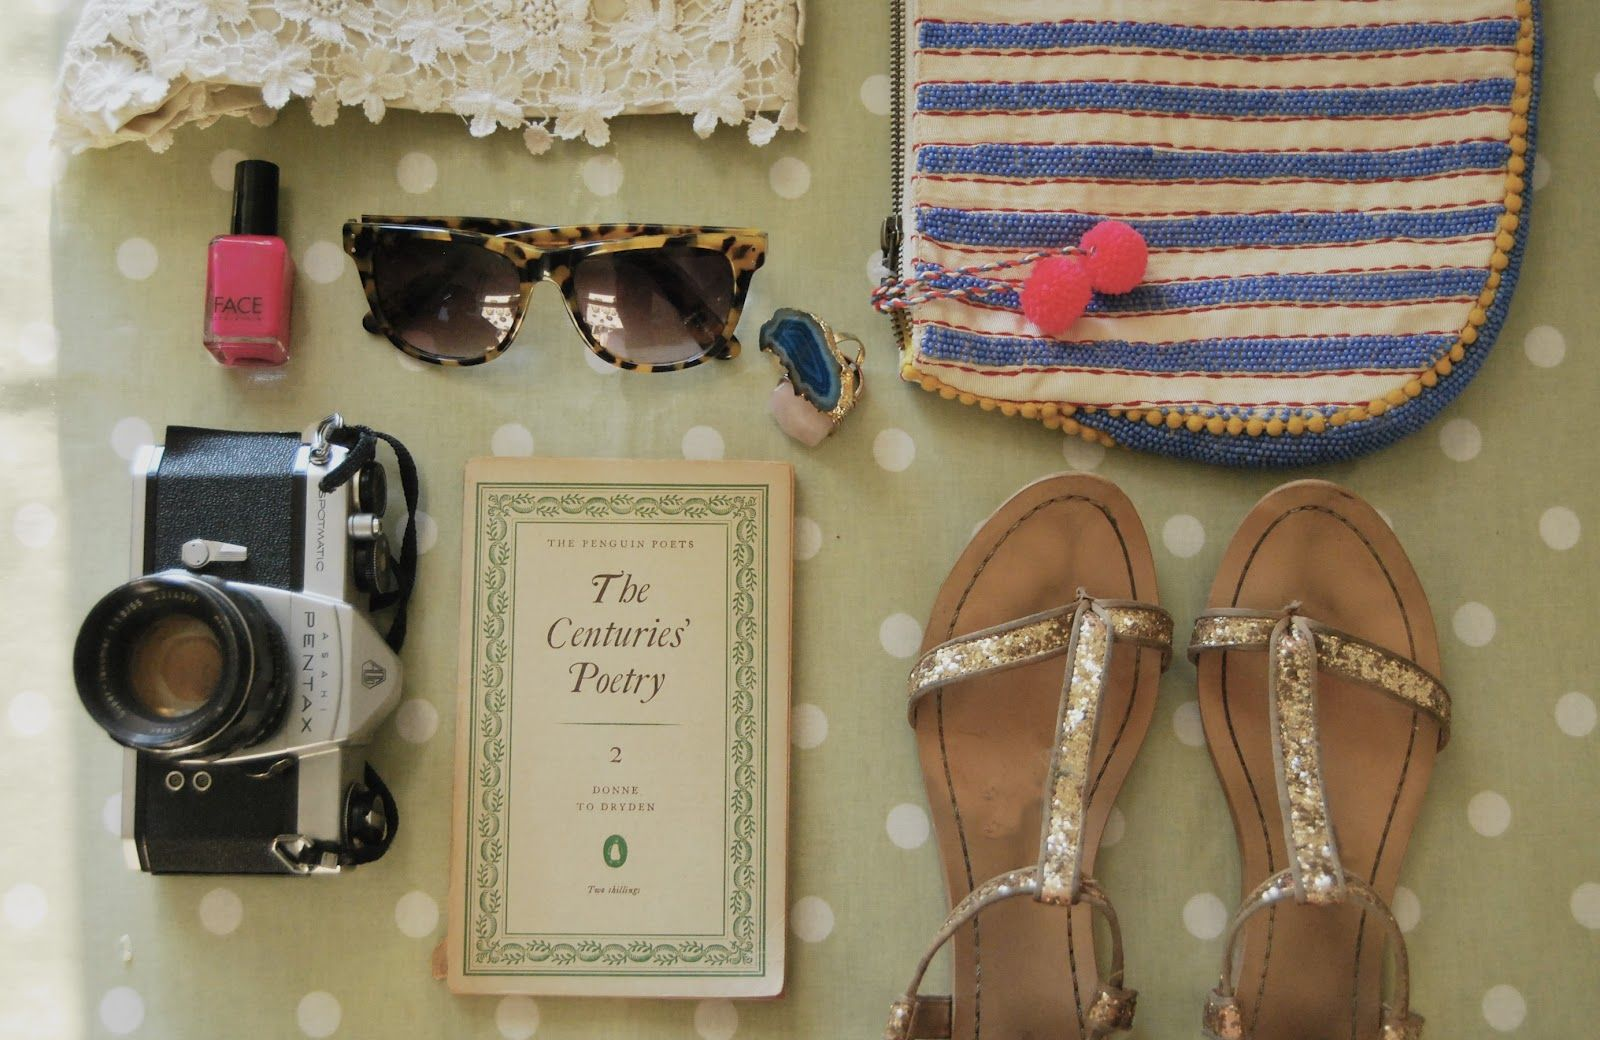 Crochet shorts: Zara, Spiked Punch nail polish: J. Crew, tortoiseshell sunnies & clutch: Anthropologie, rings: Topshop, sandals: Zara.